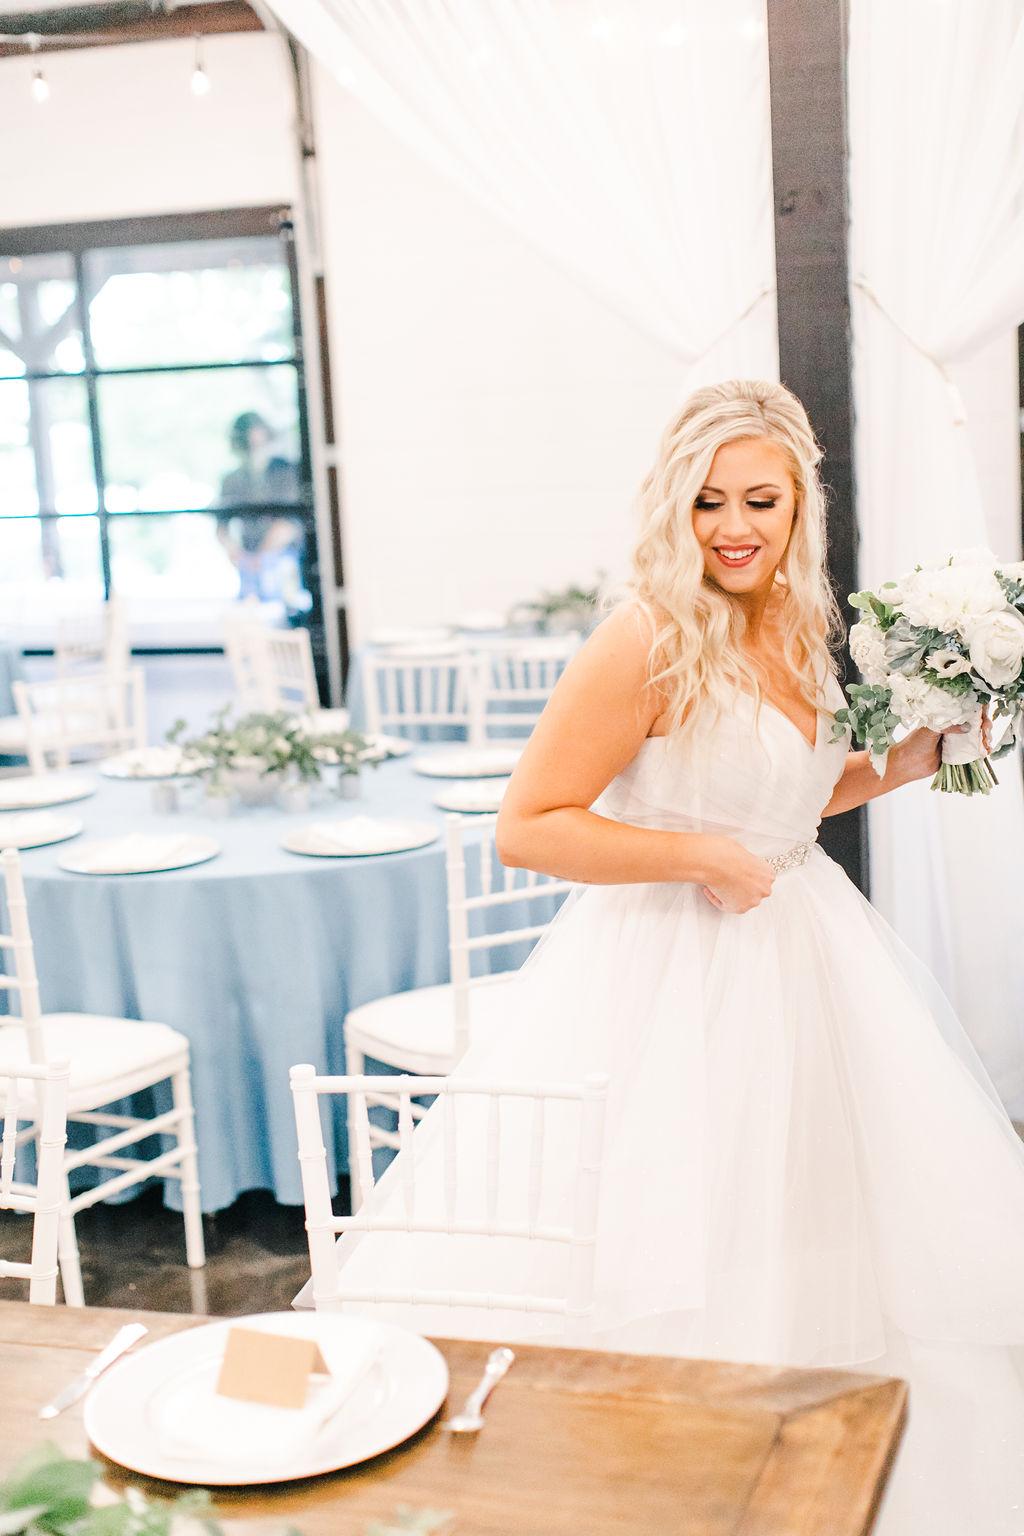 Dream Point Ranch Tulsa's White Barn Wedding Venue 28.jpg